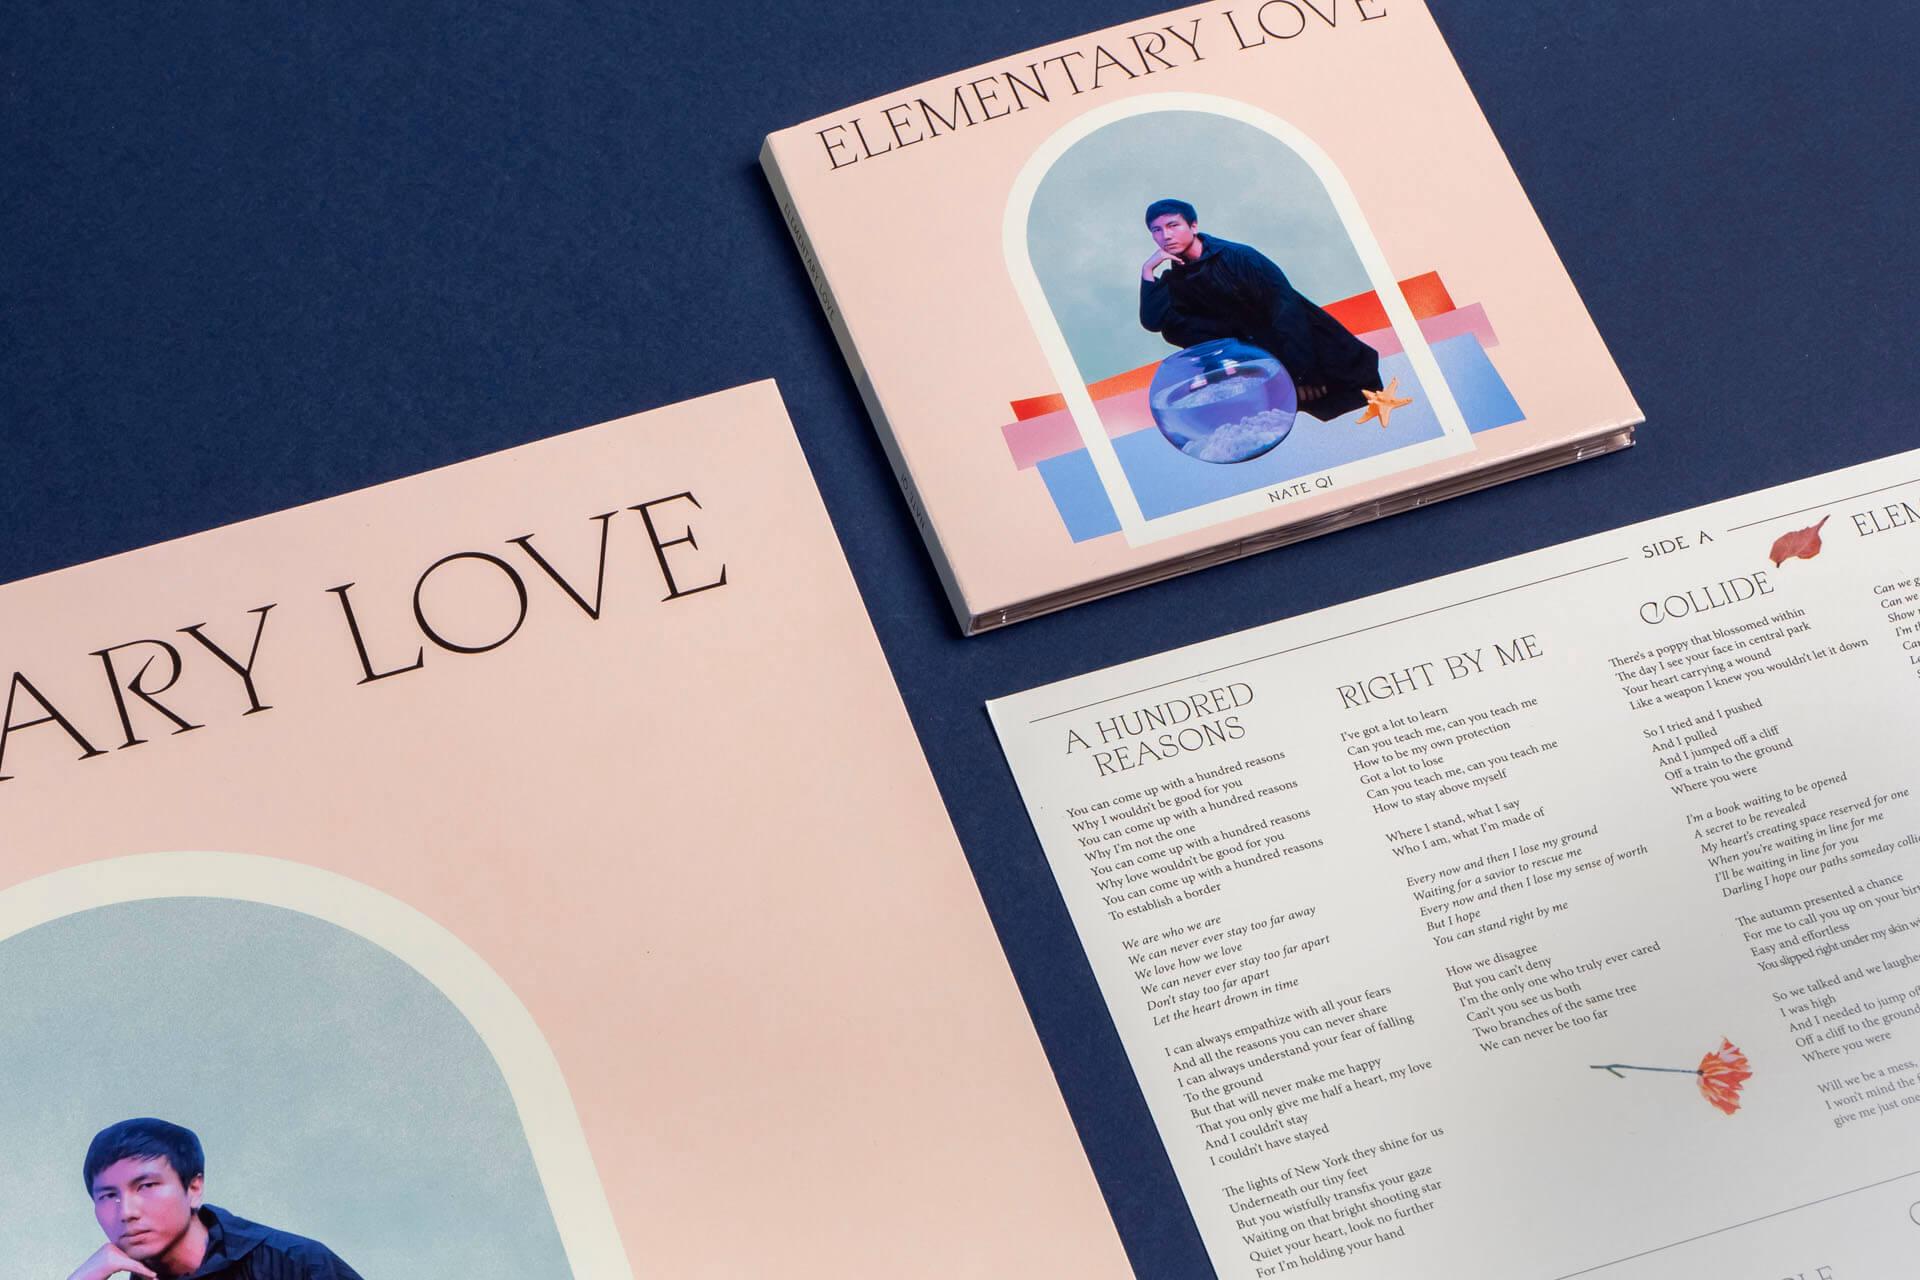 elementary-love-nate-qi-edition-vynile-cover-album-music-studio-plastac